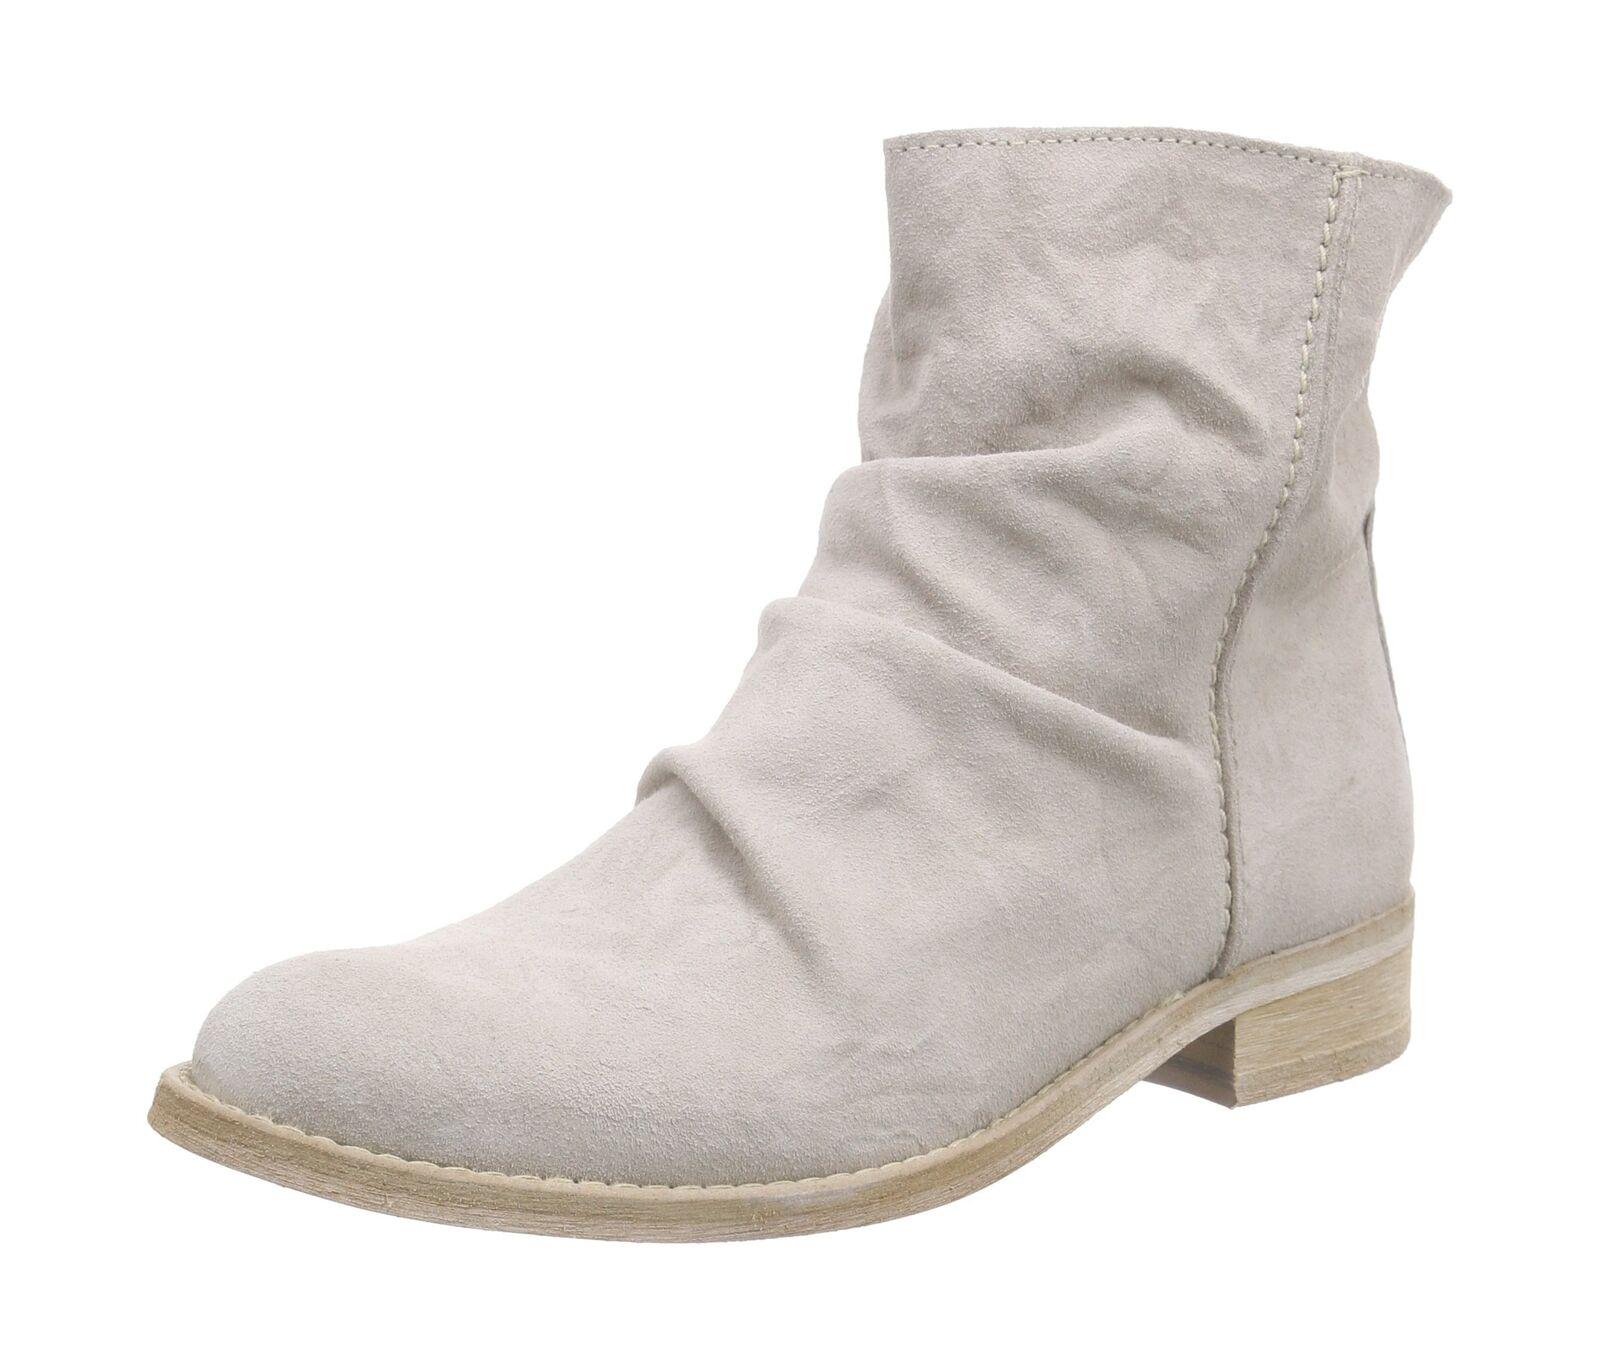 chloé mary jane talon wedge vert sombre chaussures des chaussures sombre en cuir - / 7559af